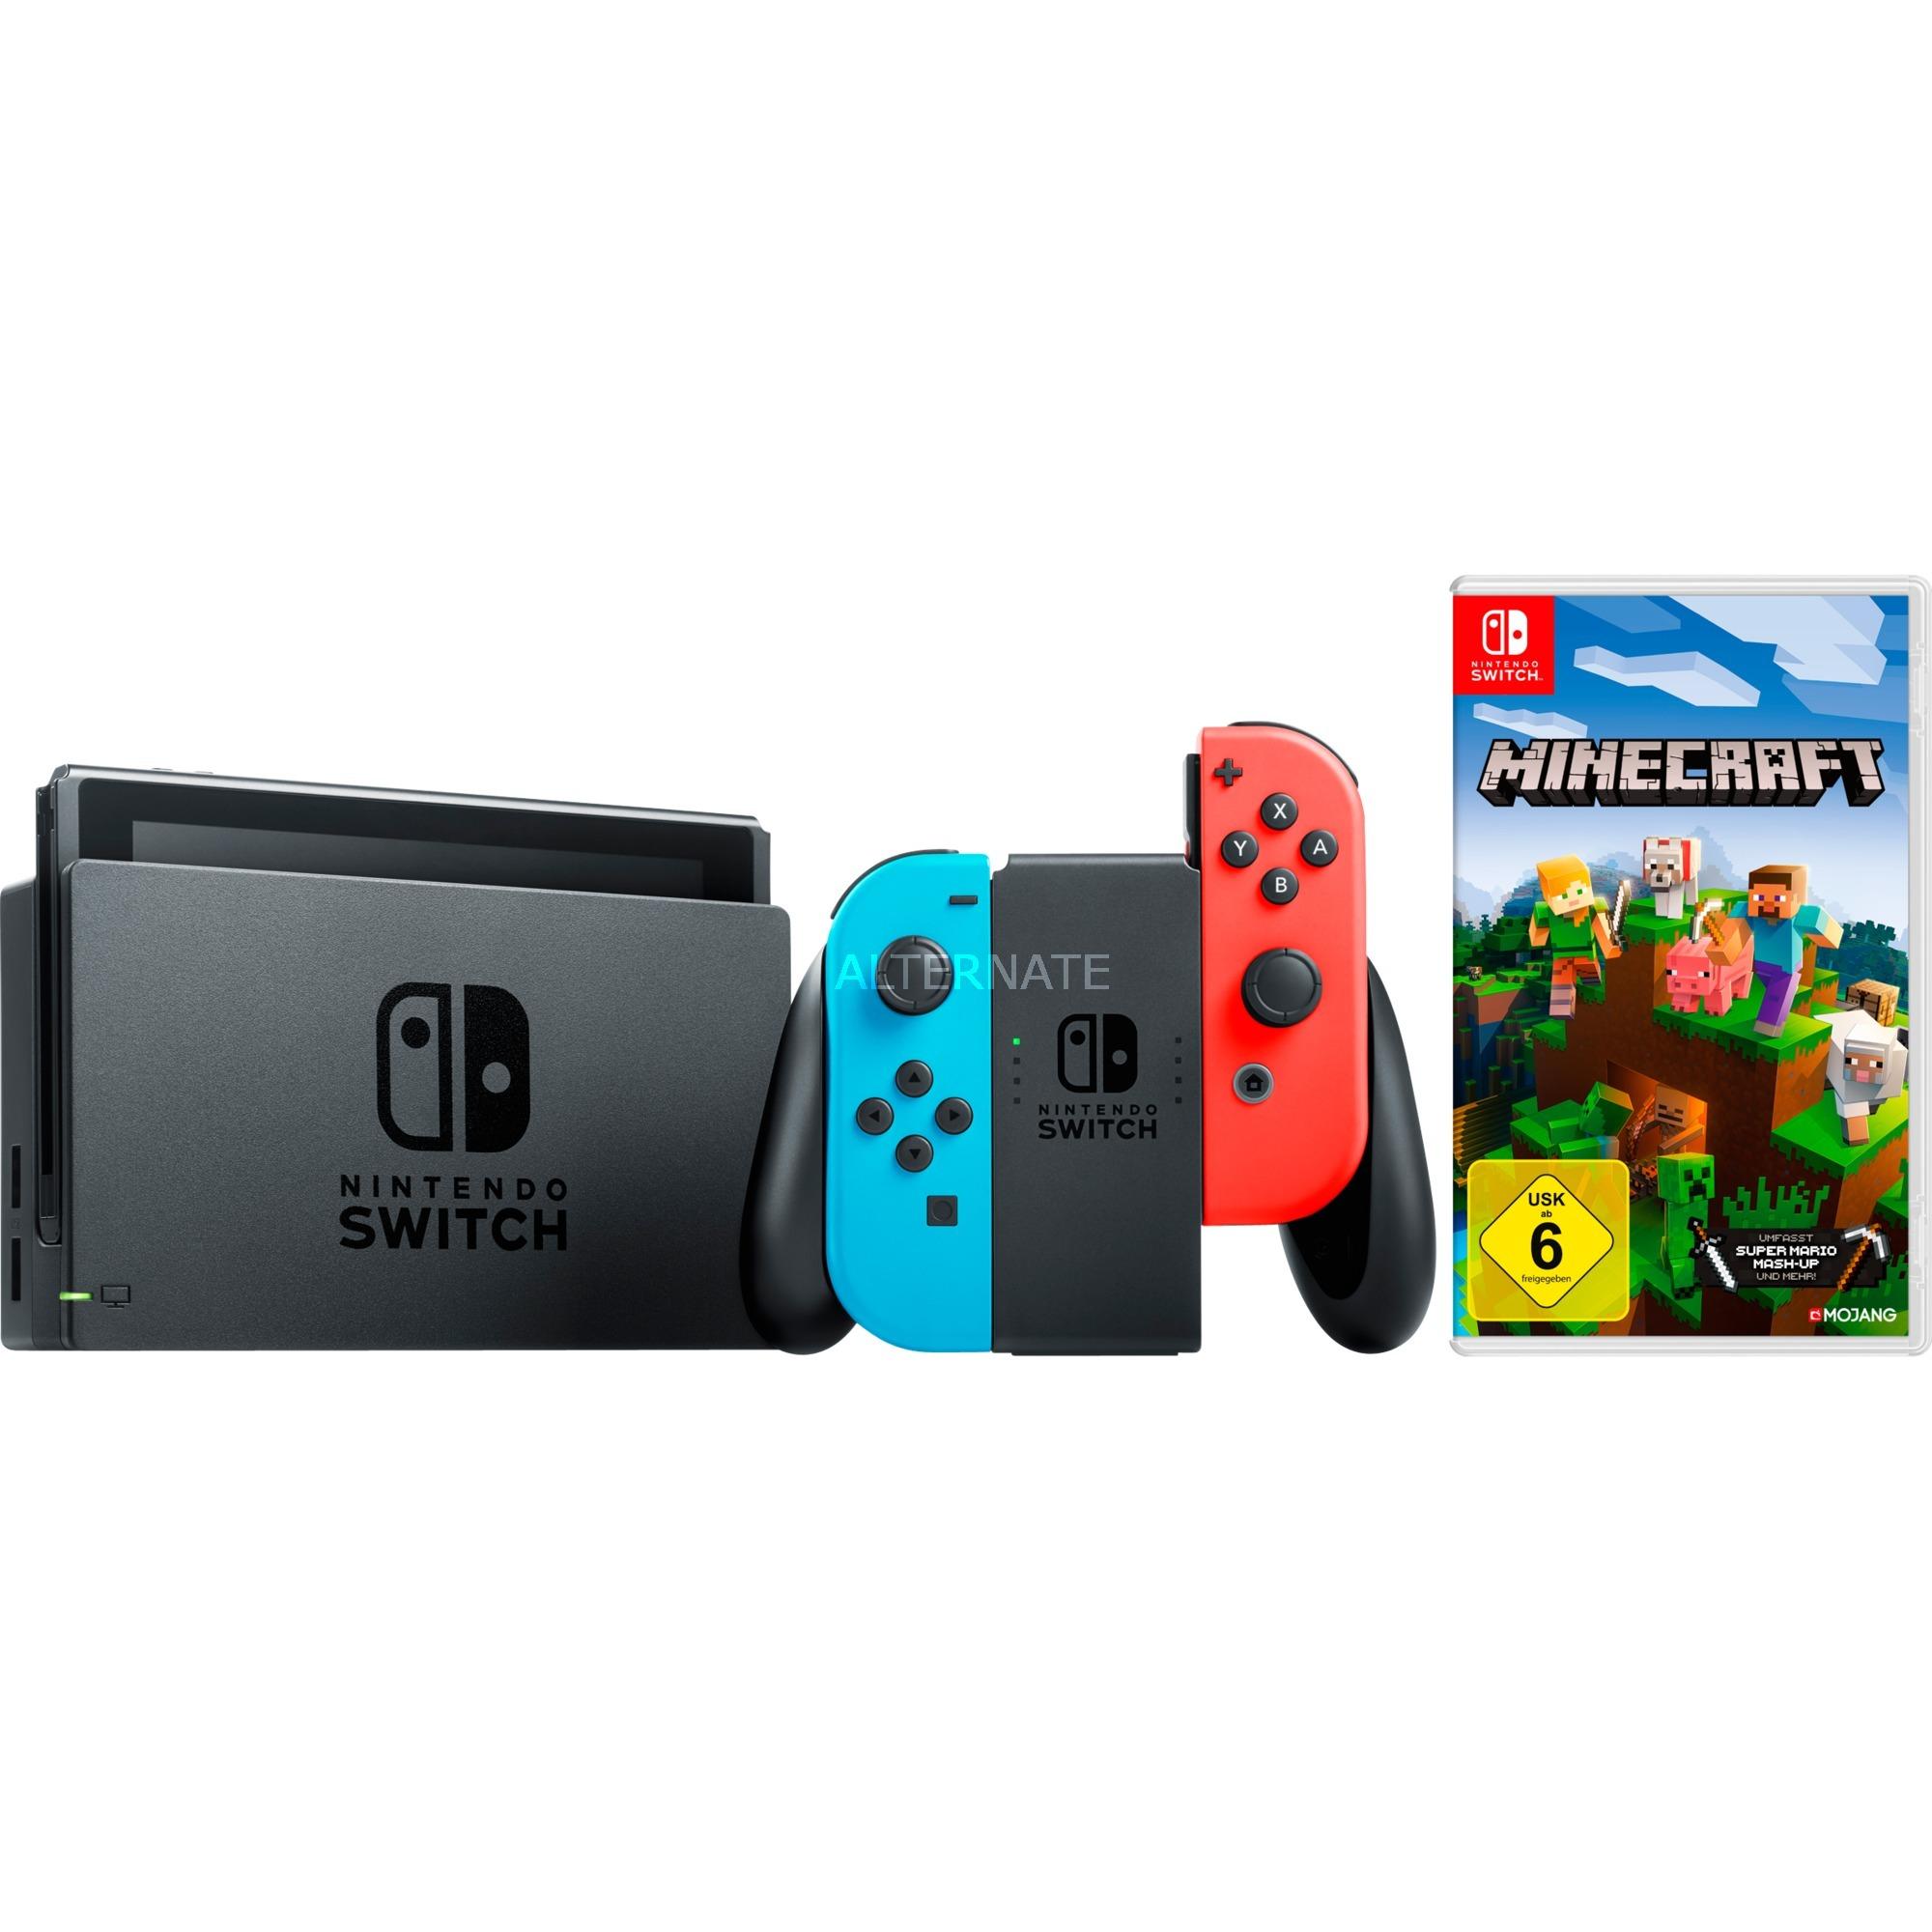 Switch + Minecraft: Nintendo Switch Edition, Videoconsola